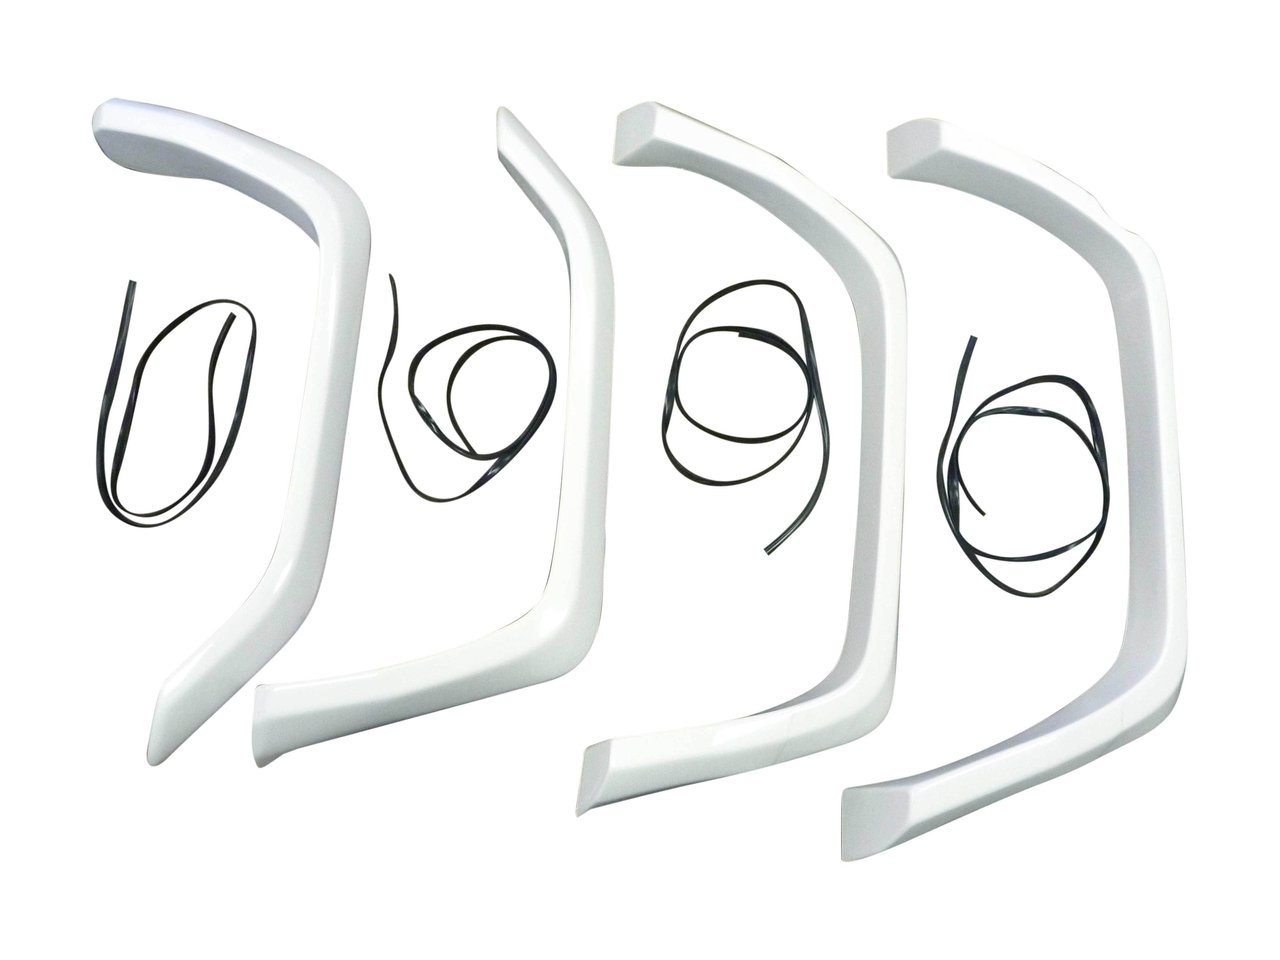 set of white fibreglass flares suitable for landcruiser vdj78